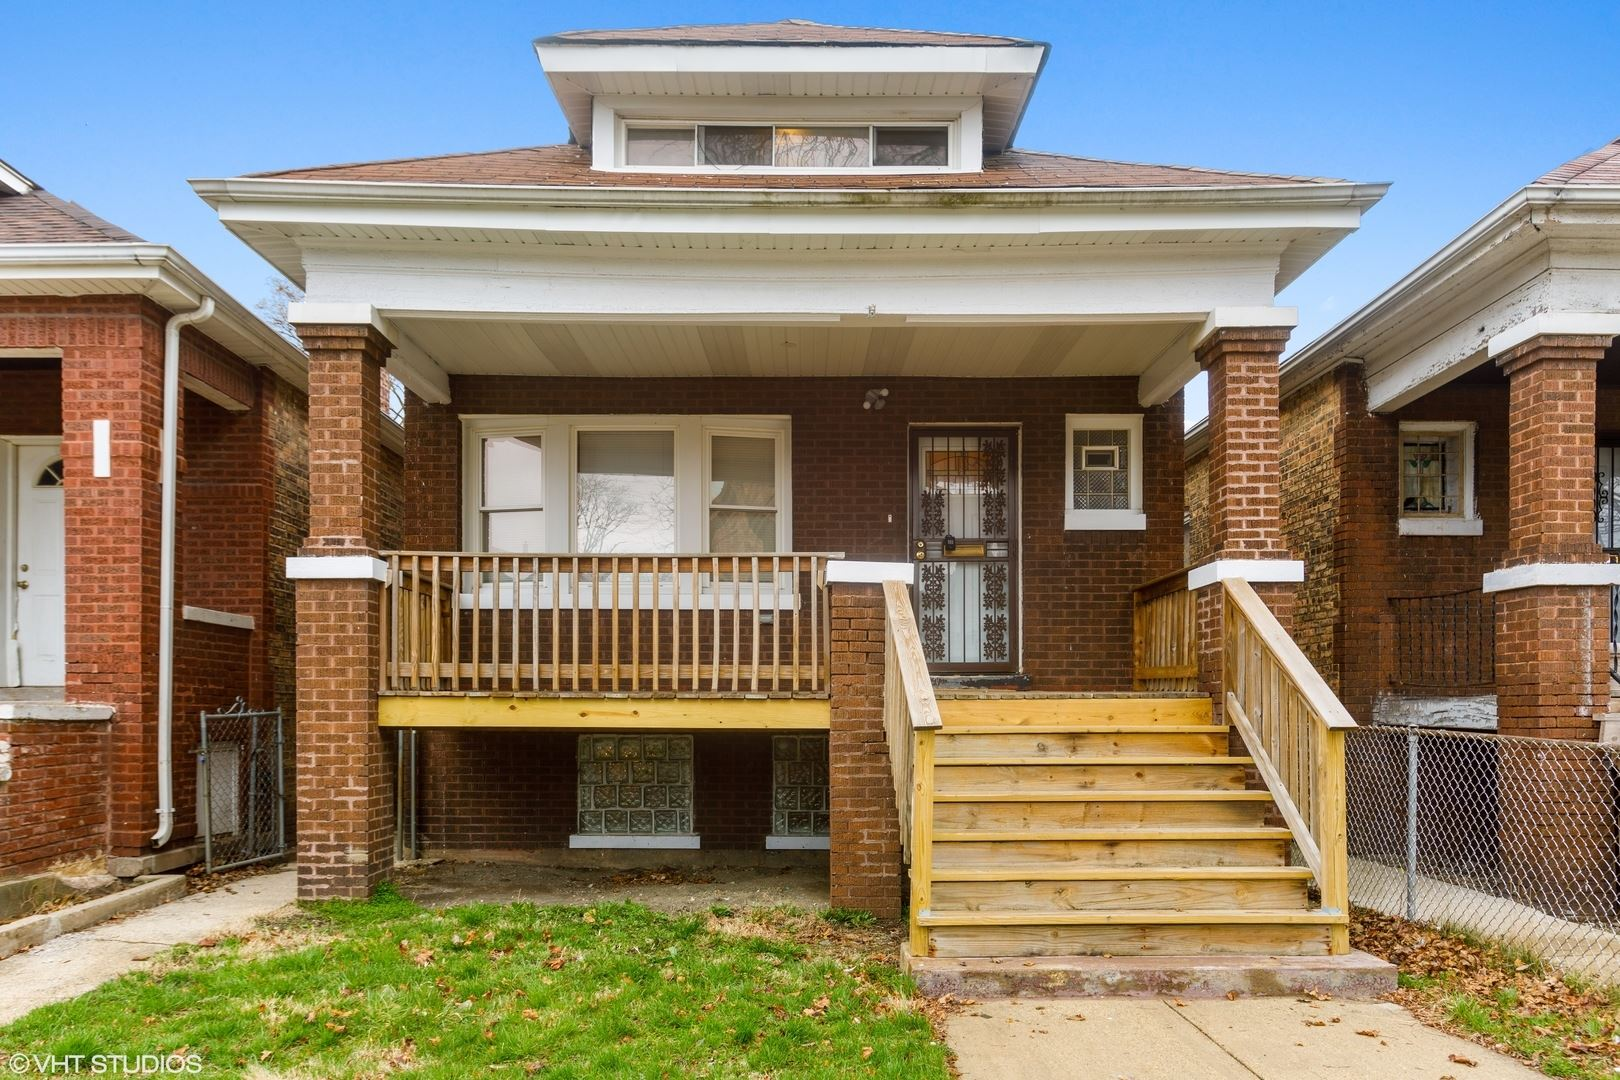 8308 S Peoria Street, Chicago, IL 60620 - MLS#: 10743021